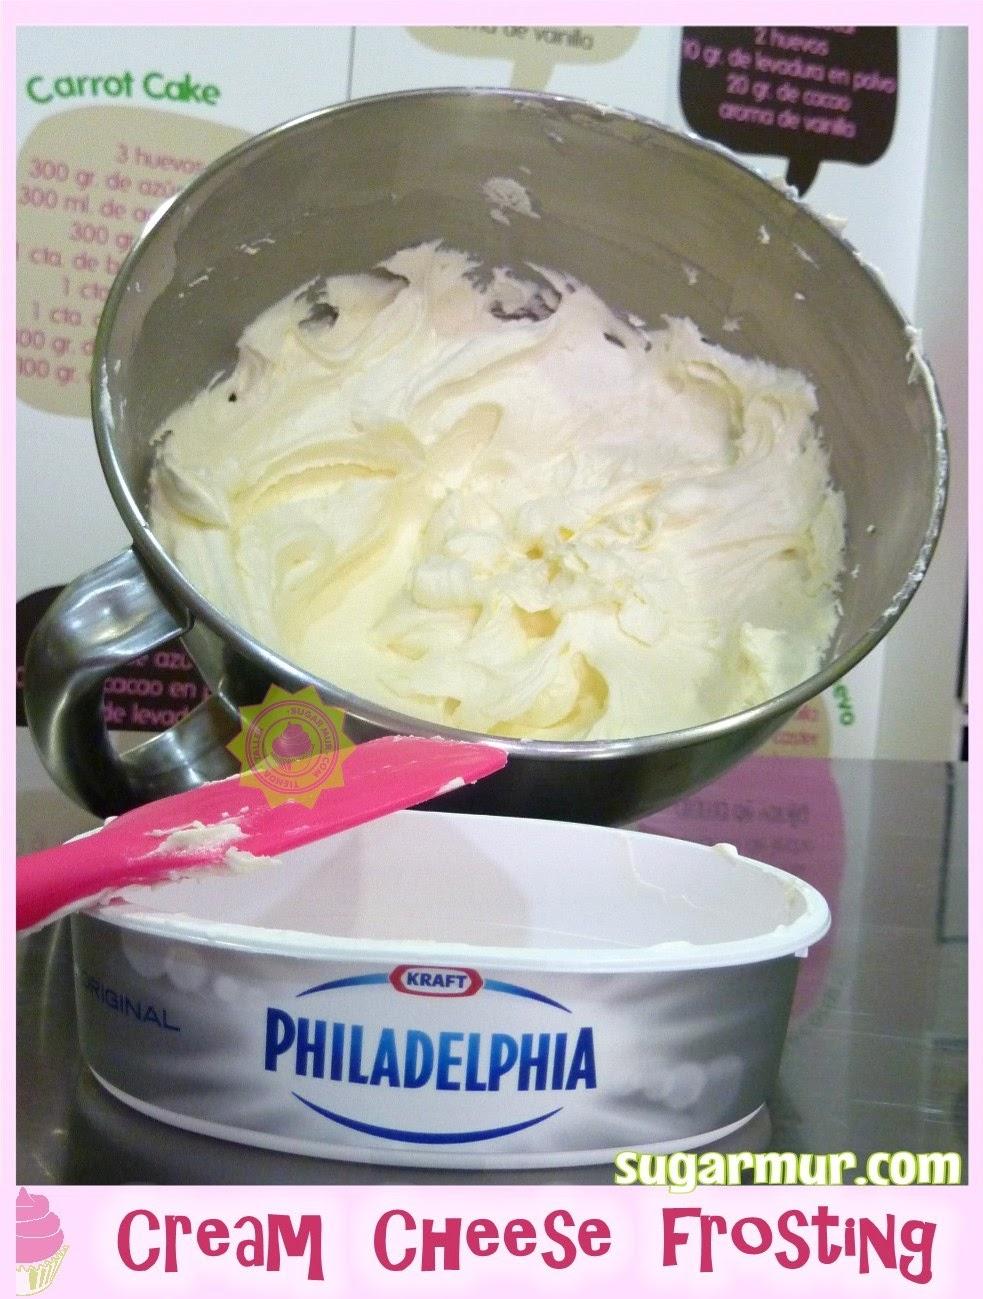 Cream cheese frosting | Sugar Mur